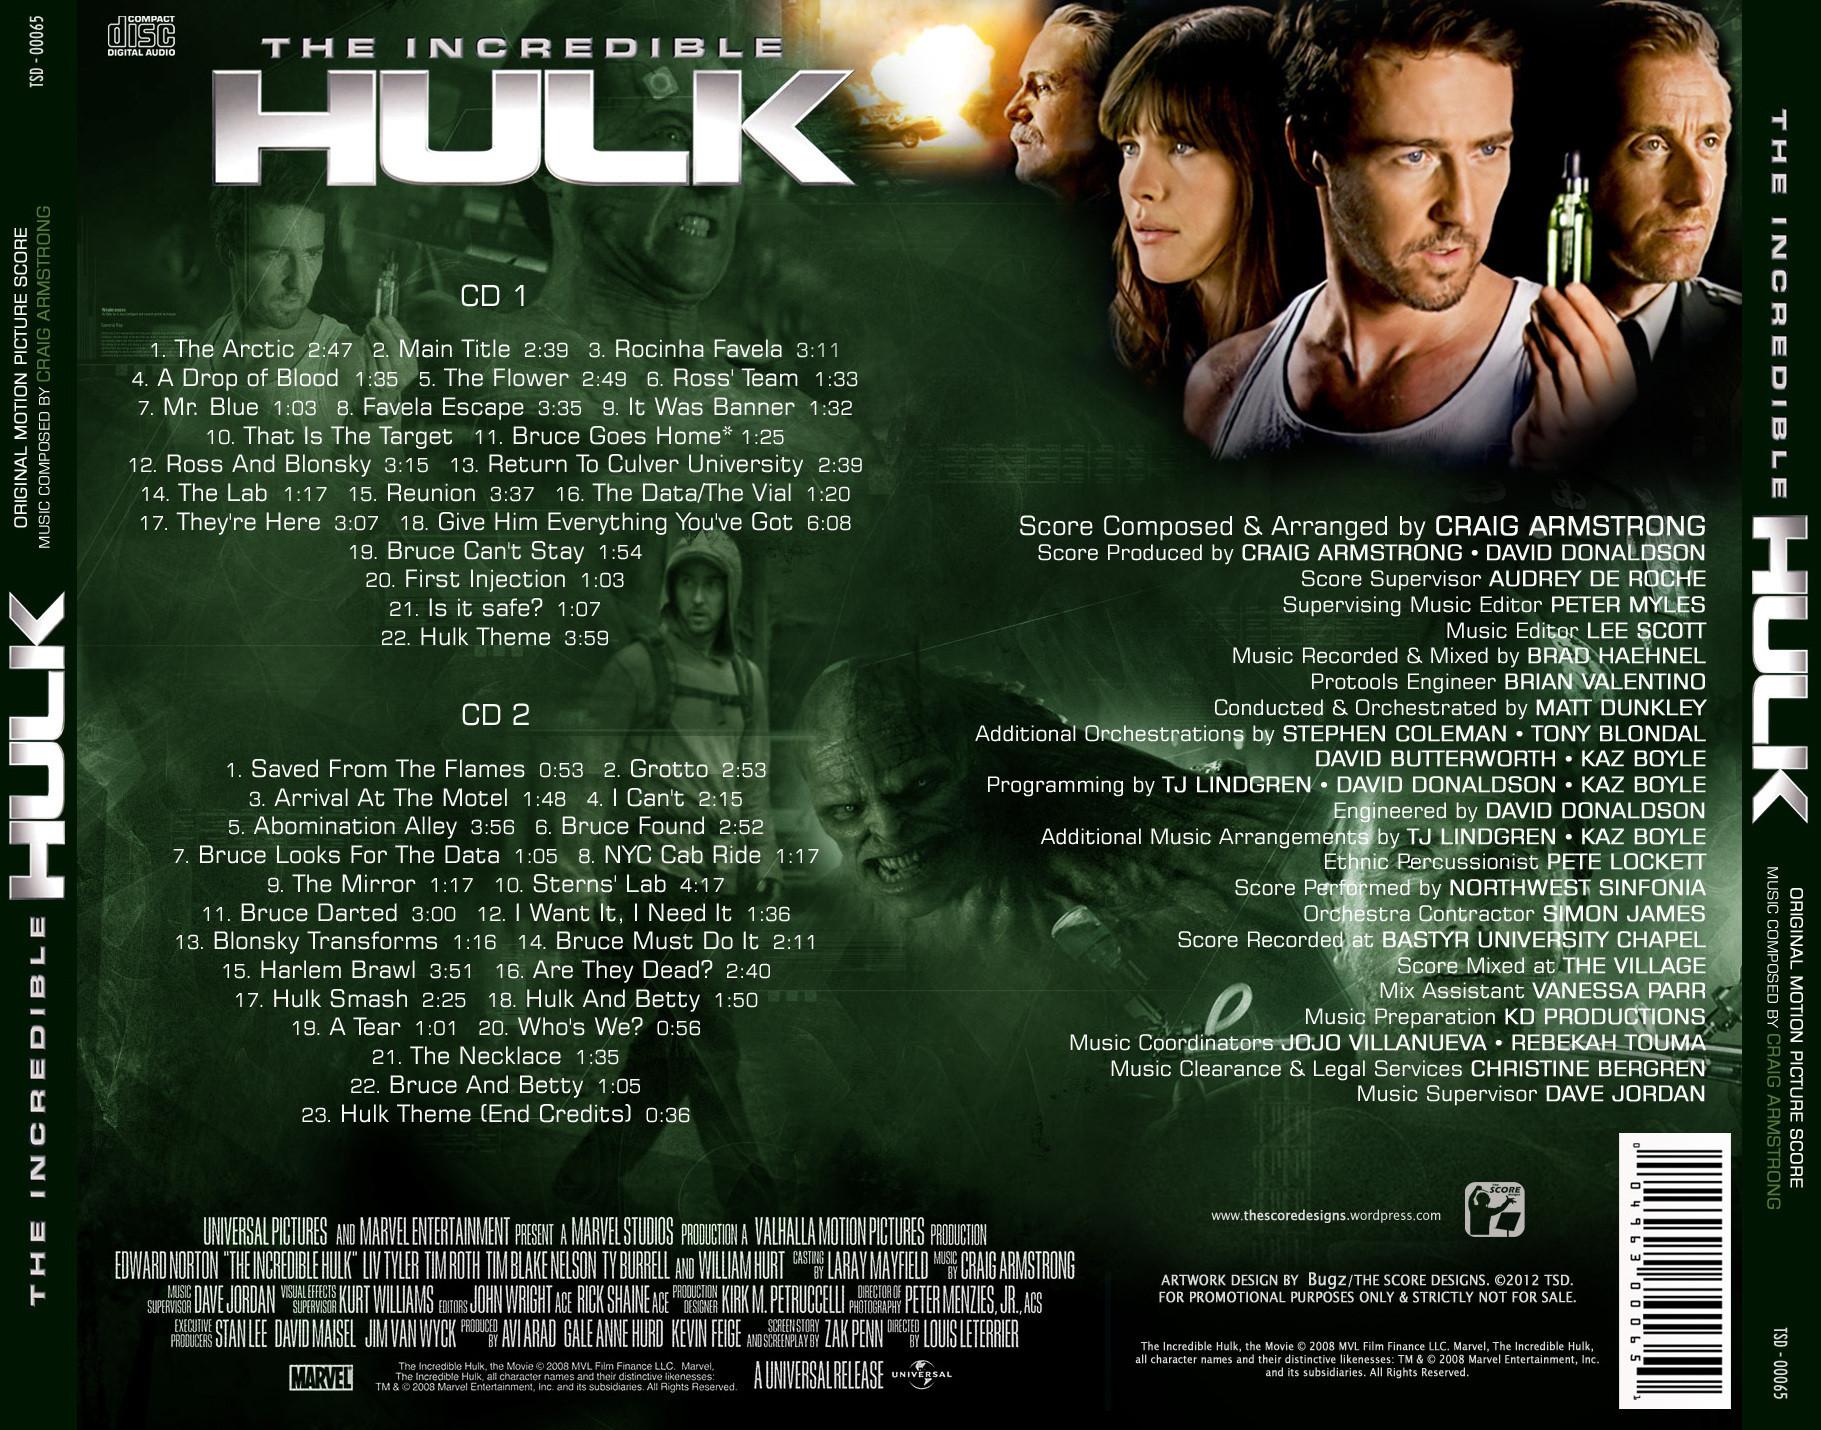 Film Music Site The Incredible Hulk Soundtrack Craig